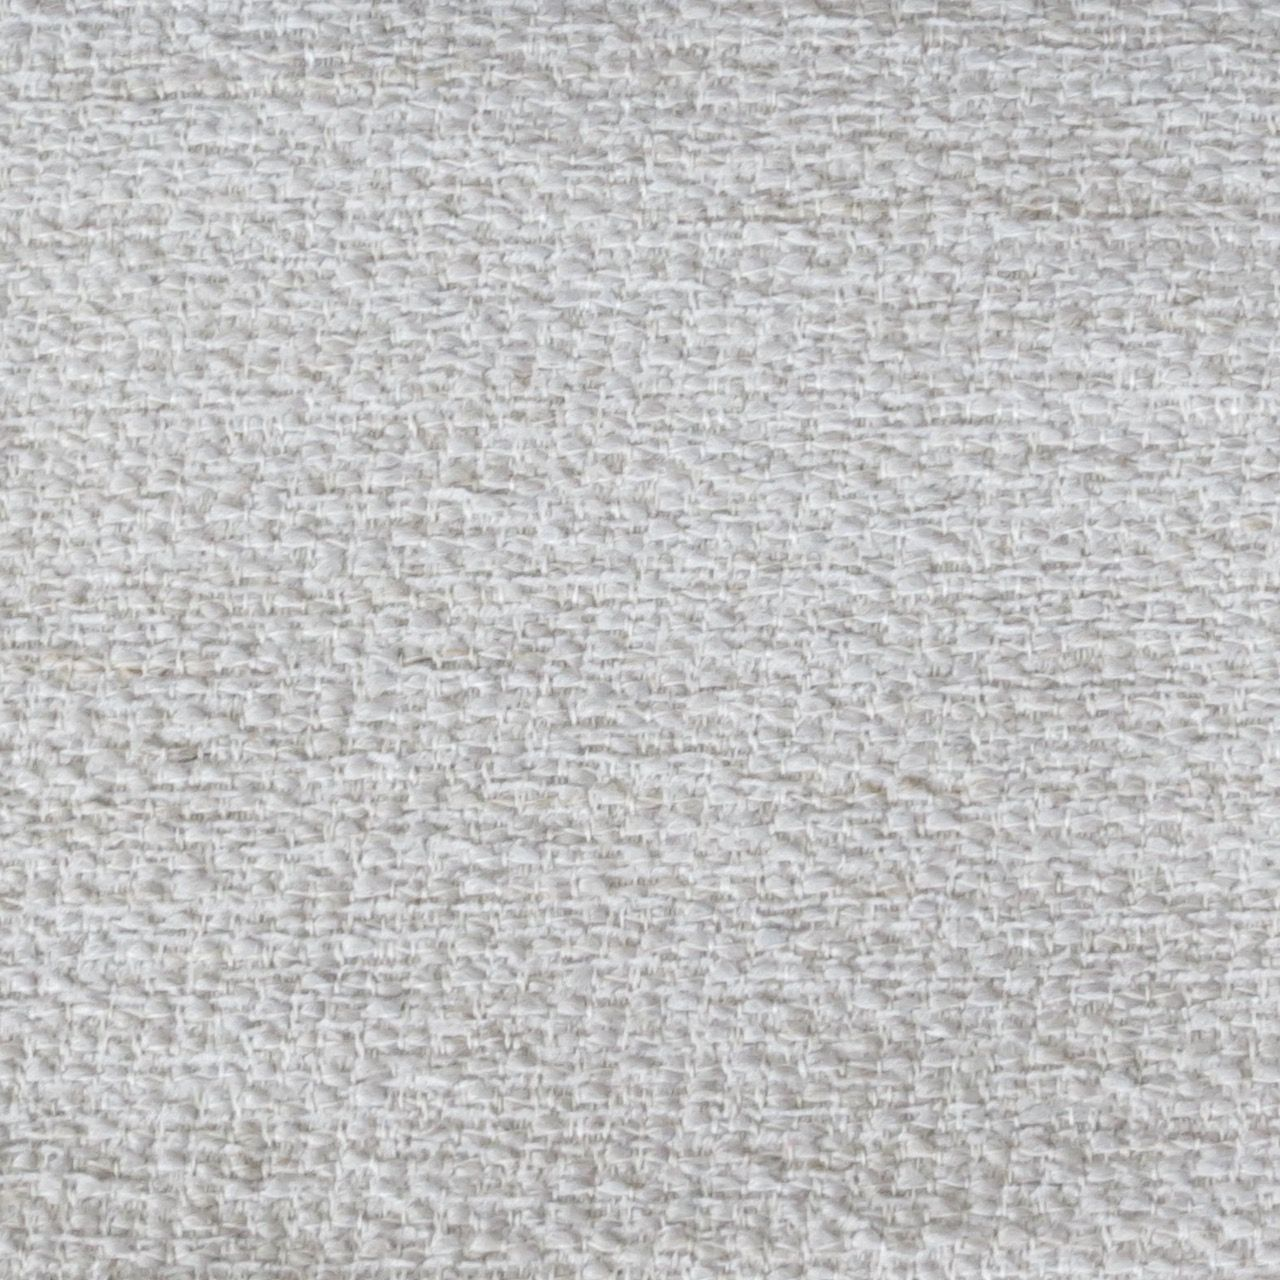 Fern Weave 03 - Fabric